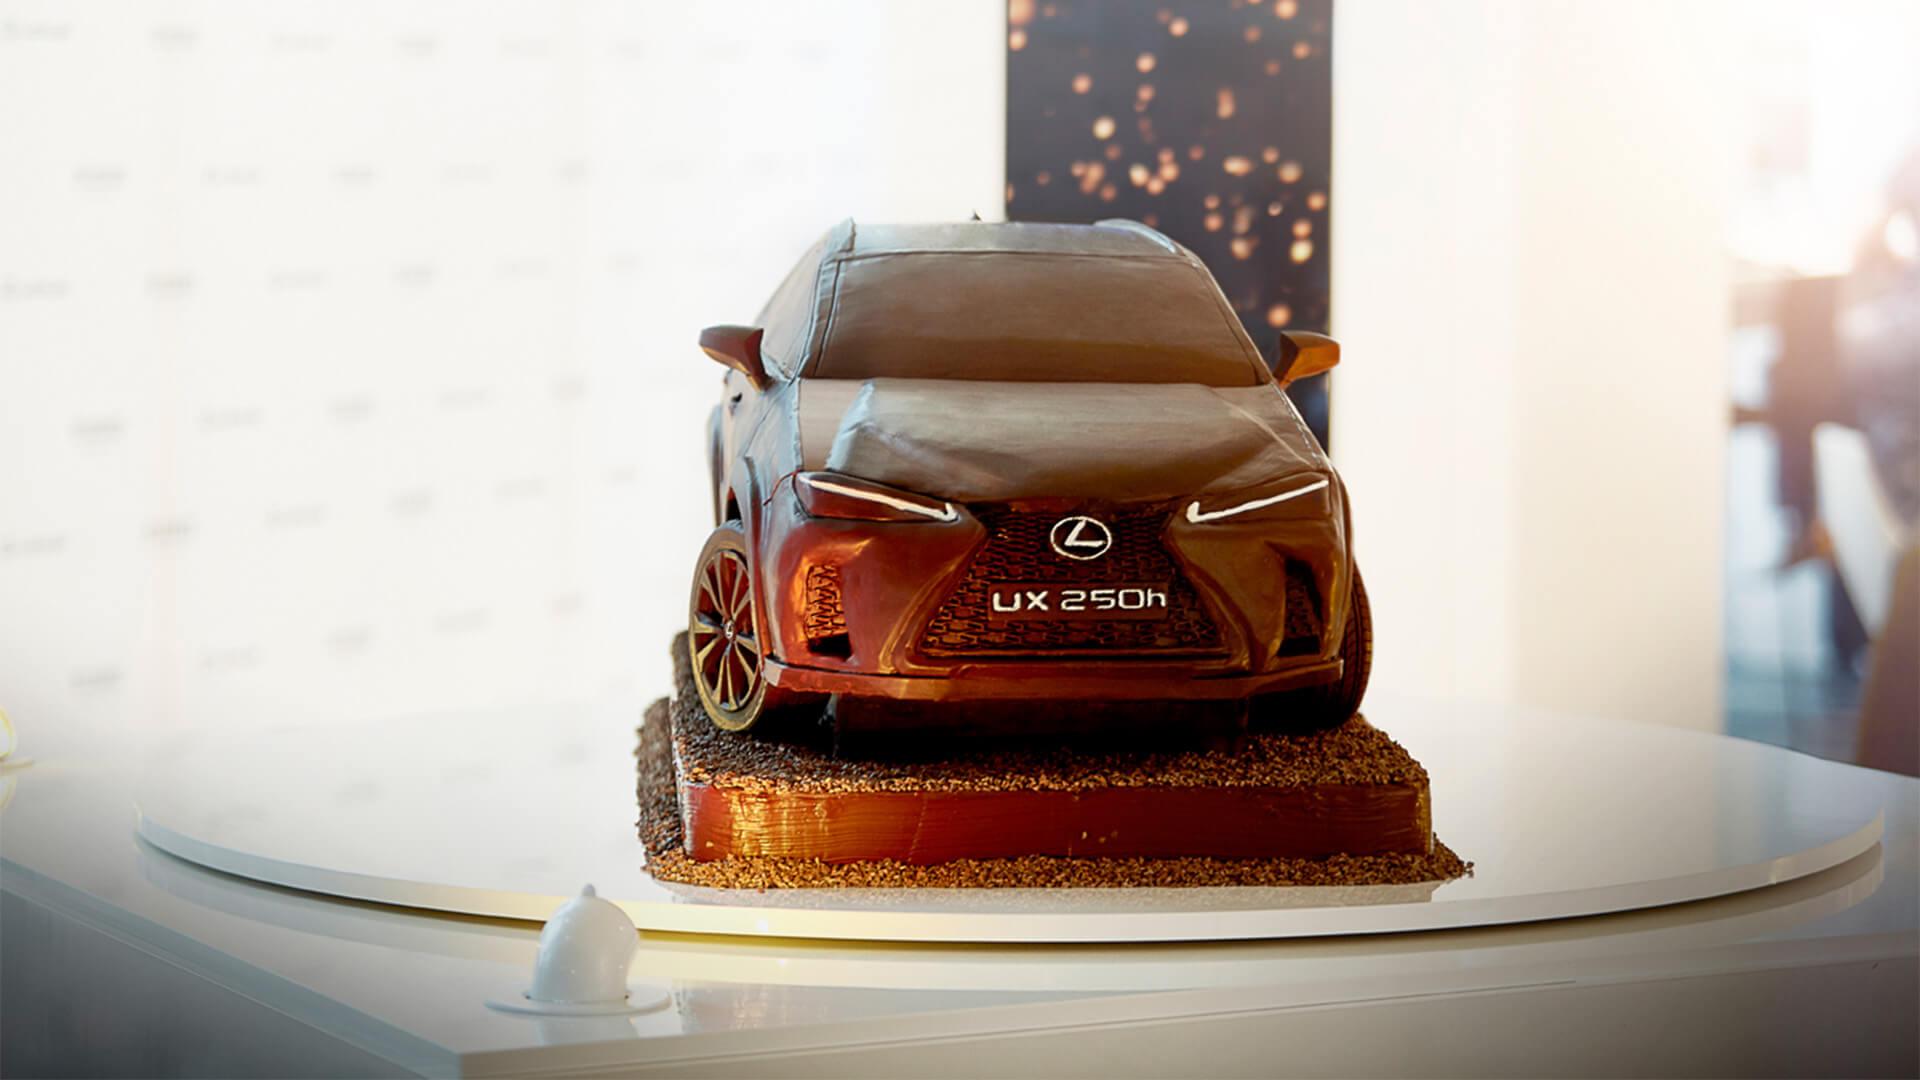 2019 lexus lounge UX Chocolate Car 1920x1080 10